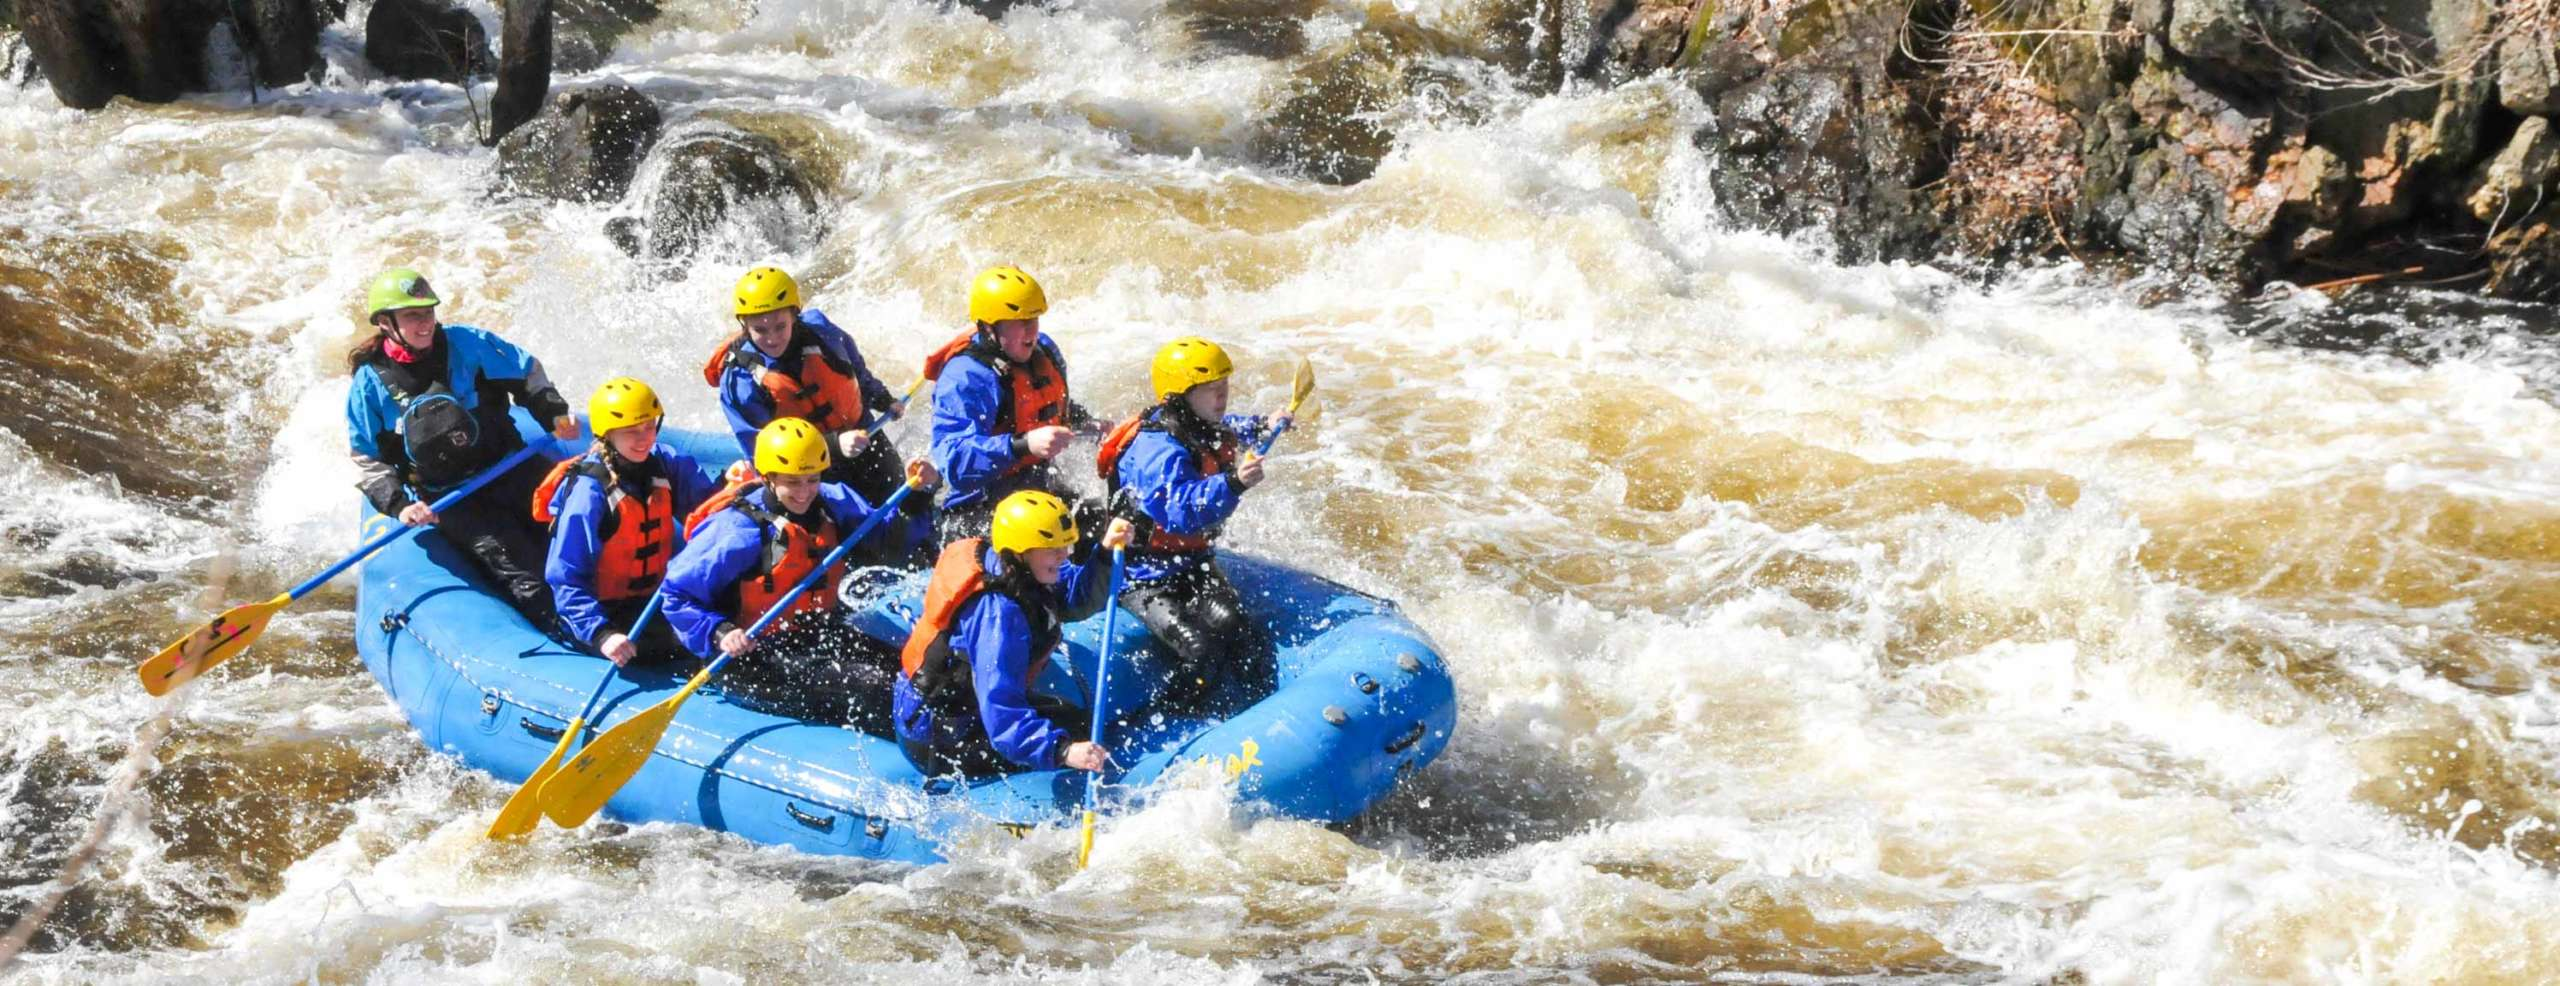 Group of people rafting through rapids